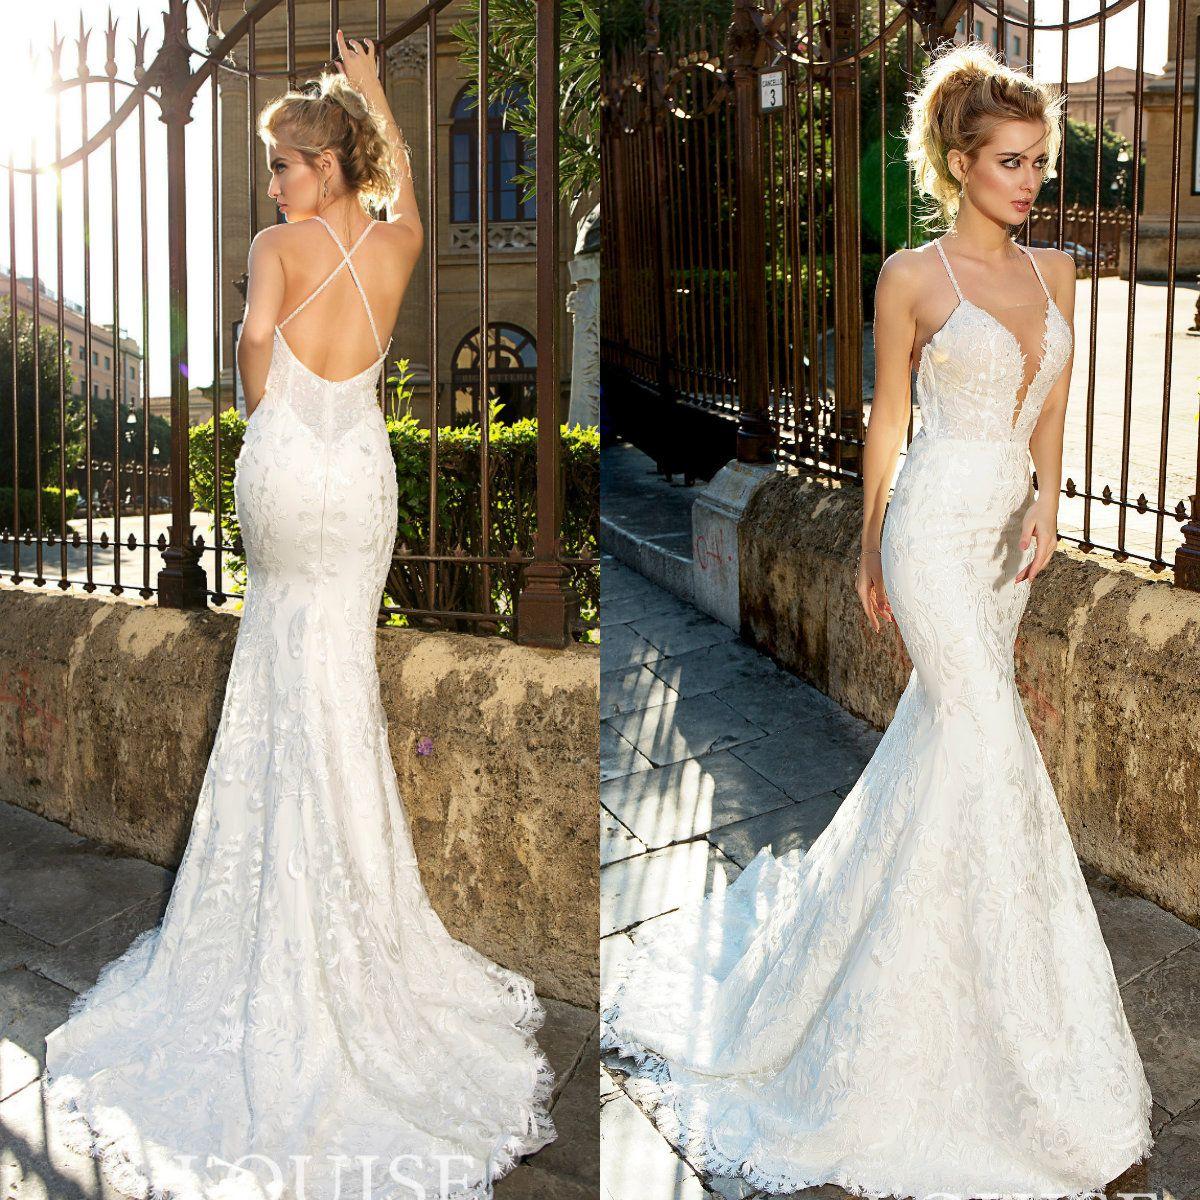 340ead37fefd Louise Sposa Sexy Mermaid Wedding Dresses Spaghetti Straps Lace Applique  Backless Sweep Train Bridal Gowns Custom Made Vestido De Novia Mermaid Tail  Wedding ...